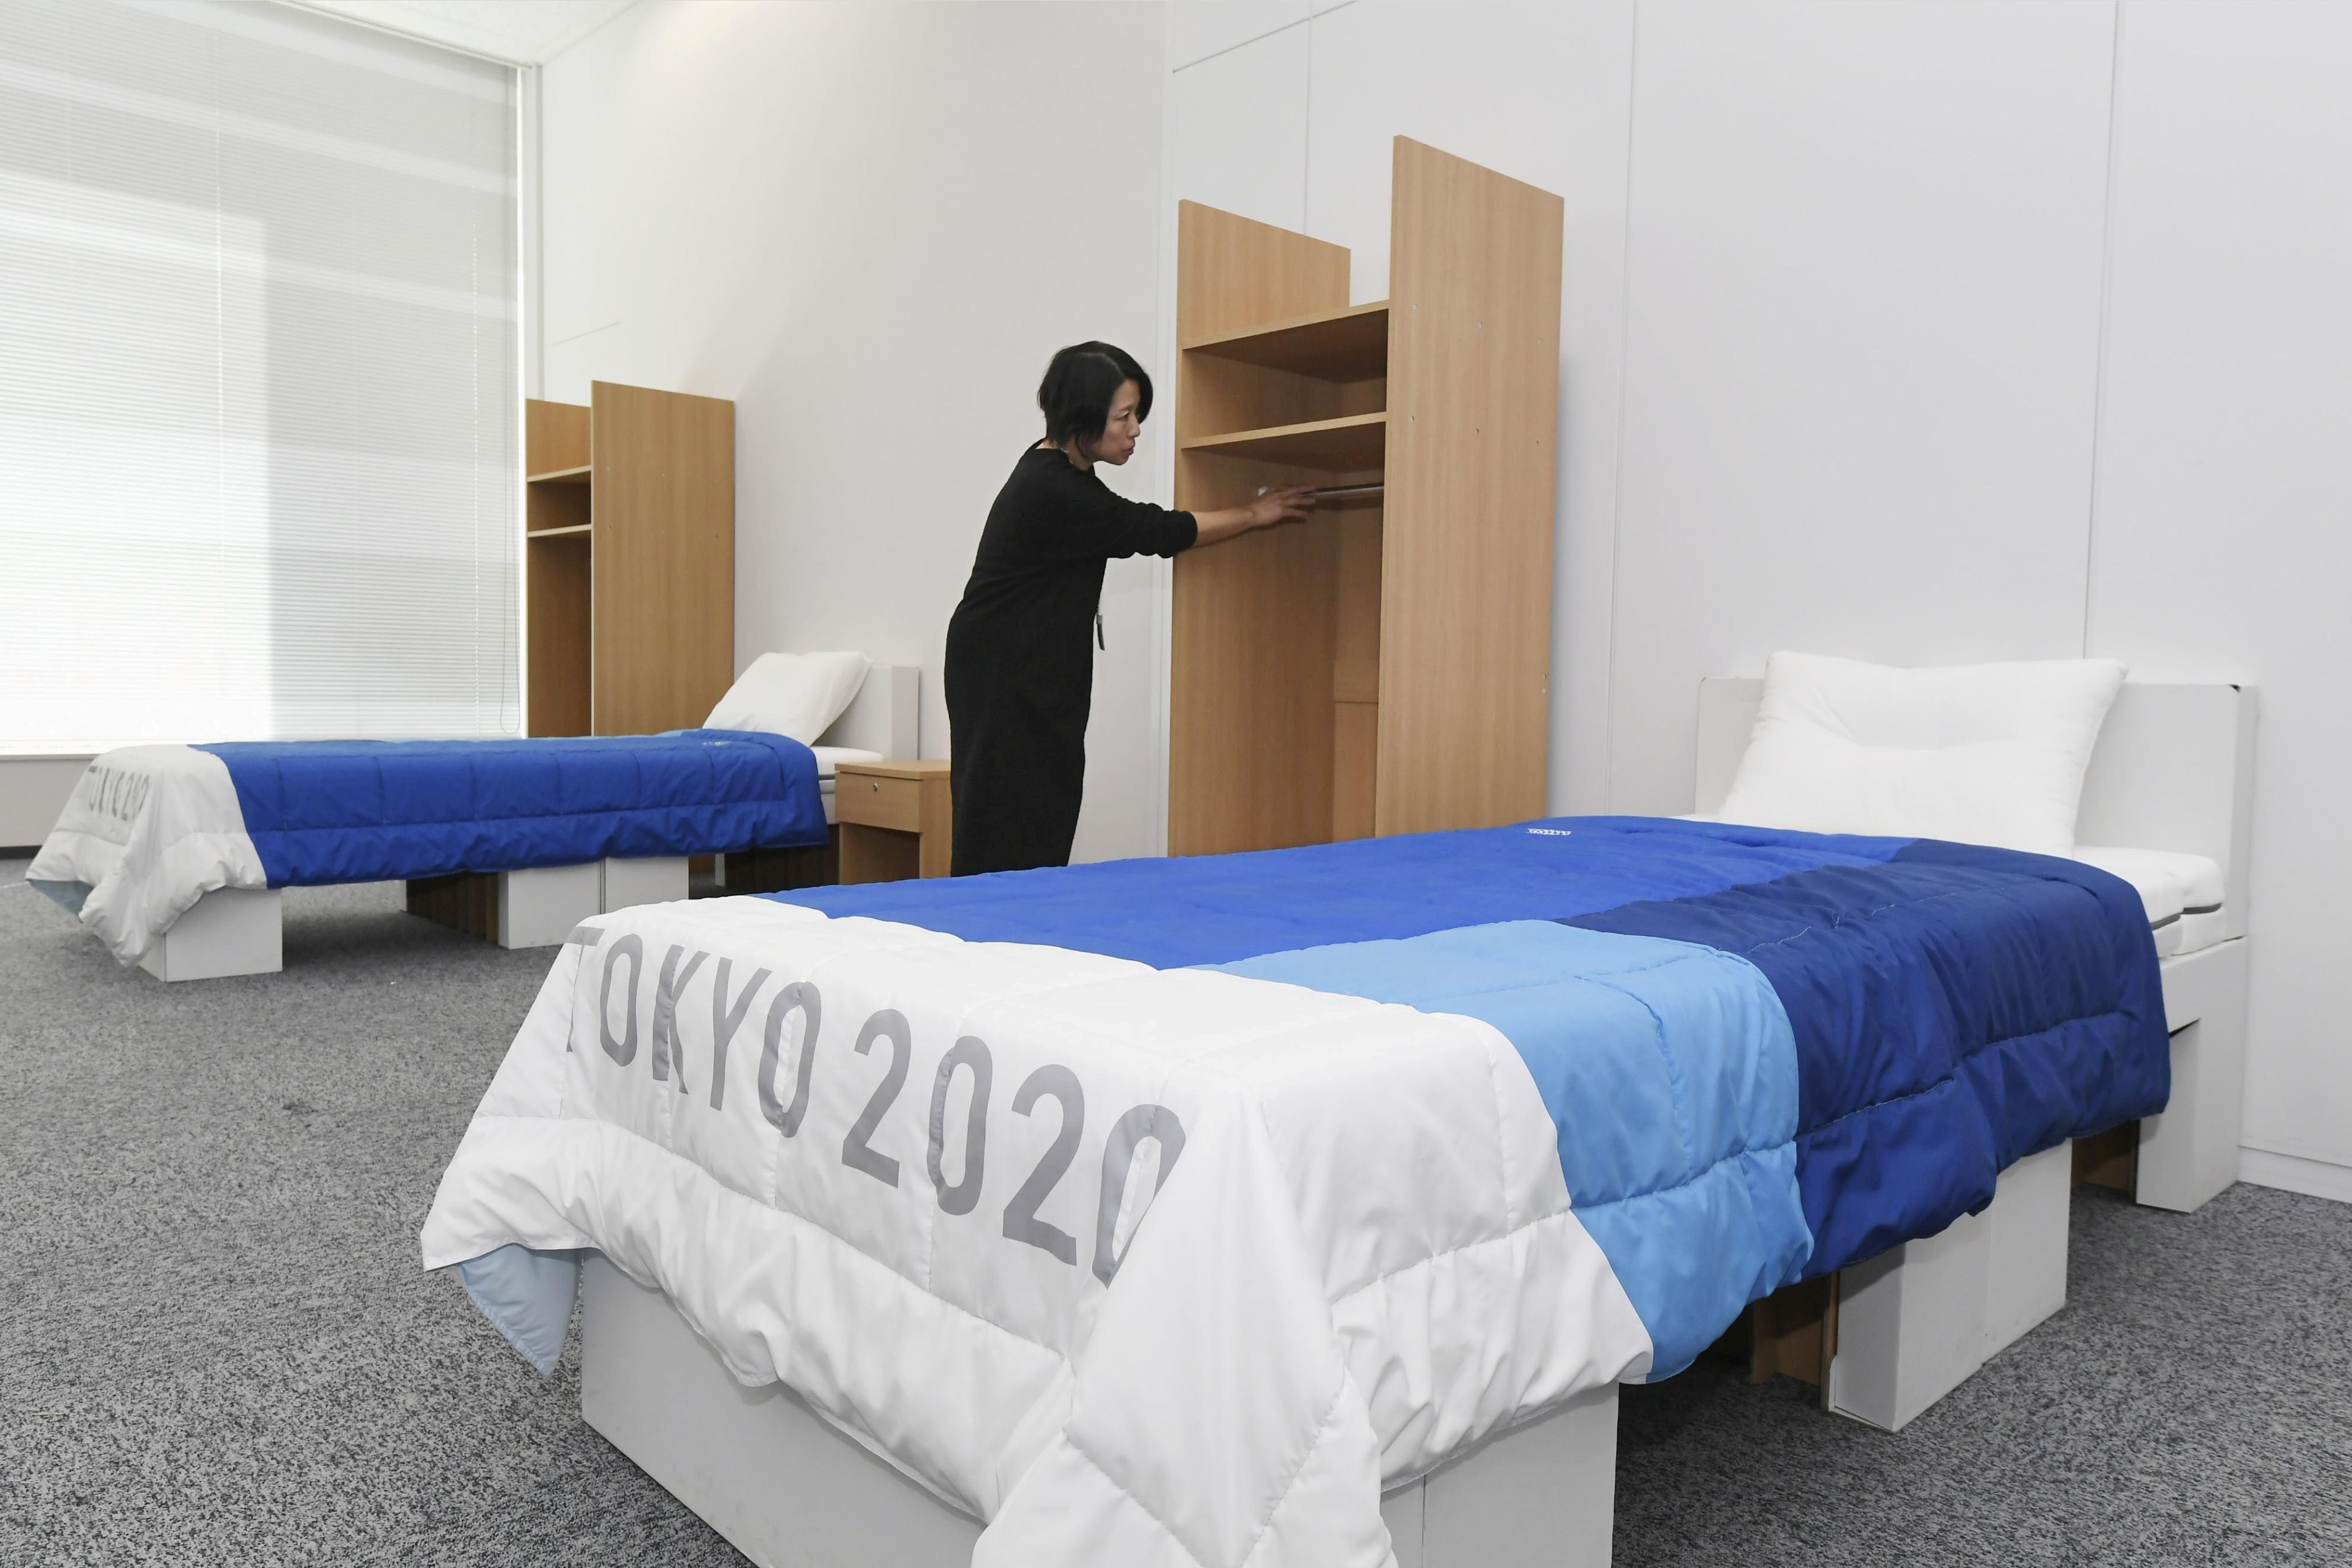 Irish gymnast leaps on cardboard beds at Athletes Village to bust  'anti-sex' myth | Reuters